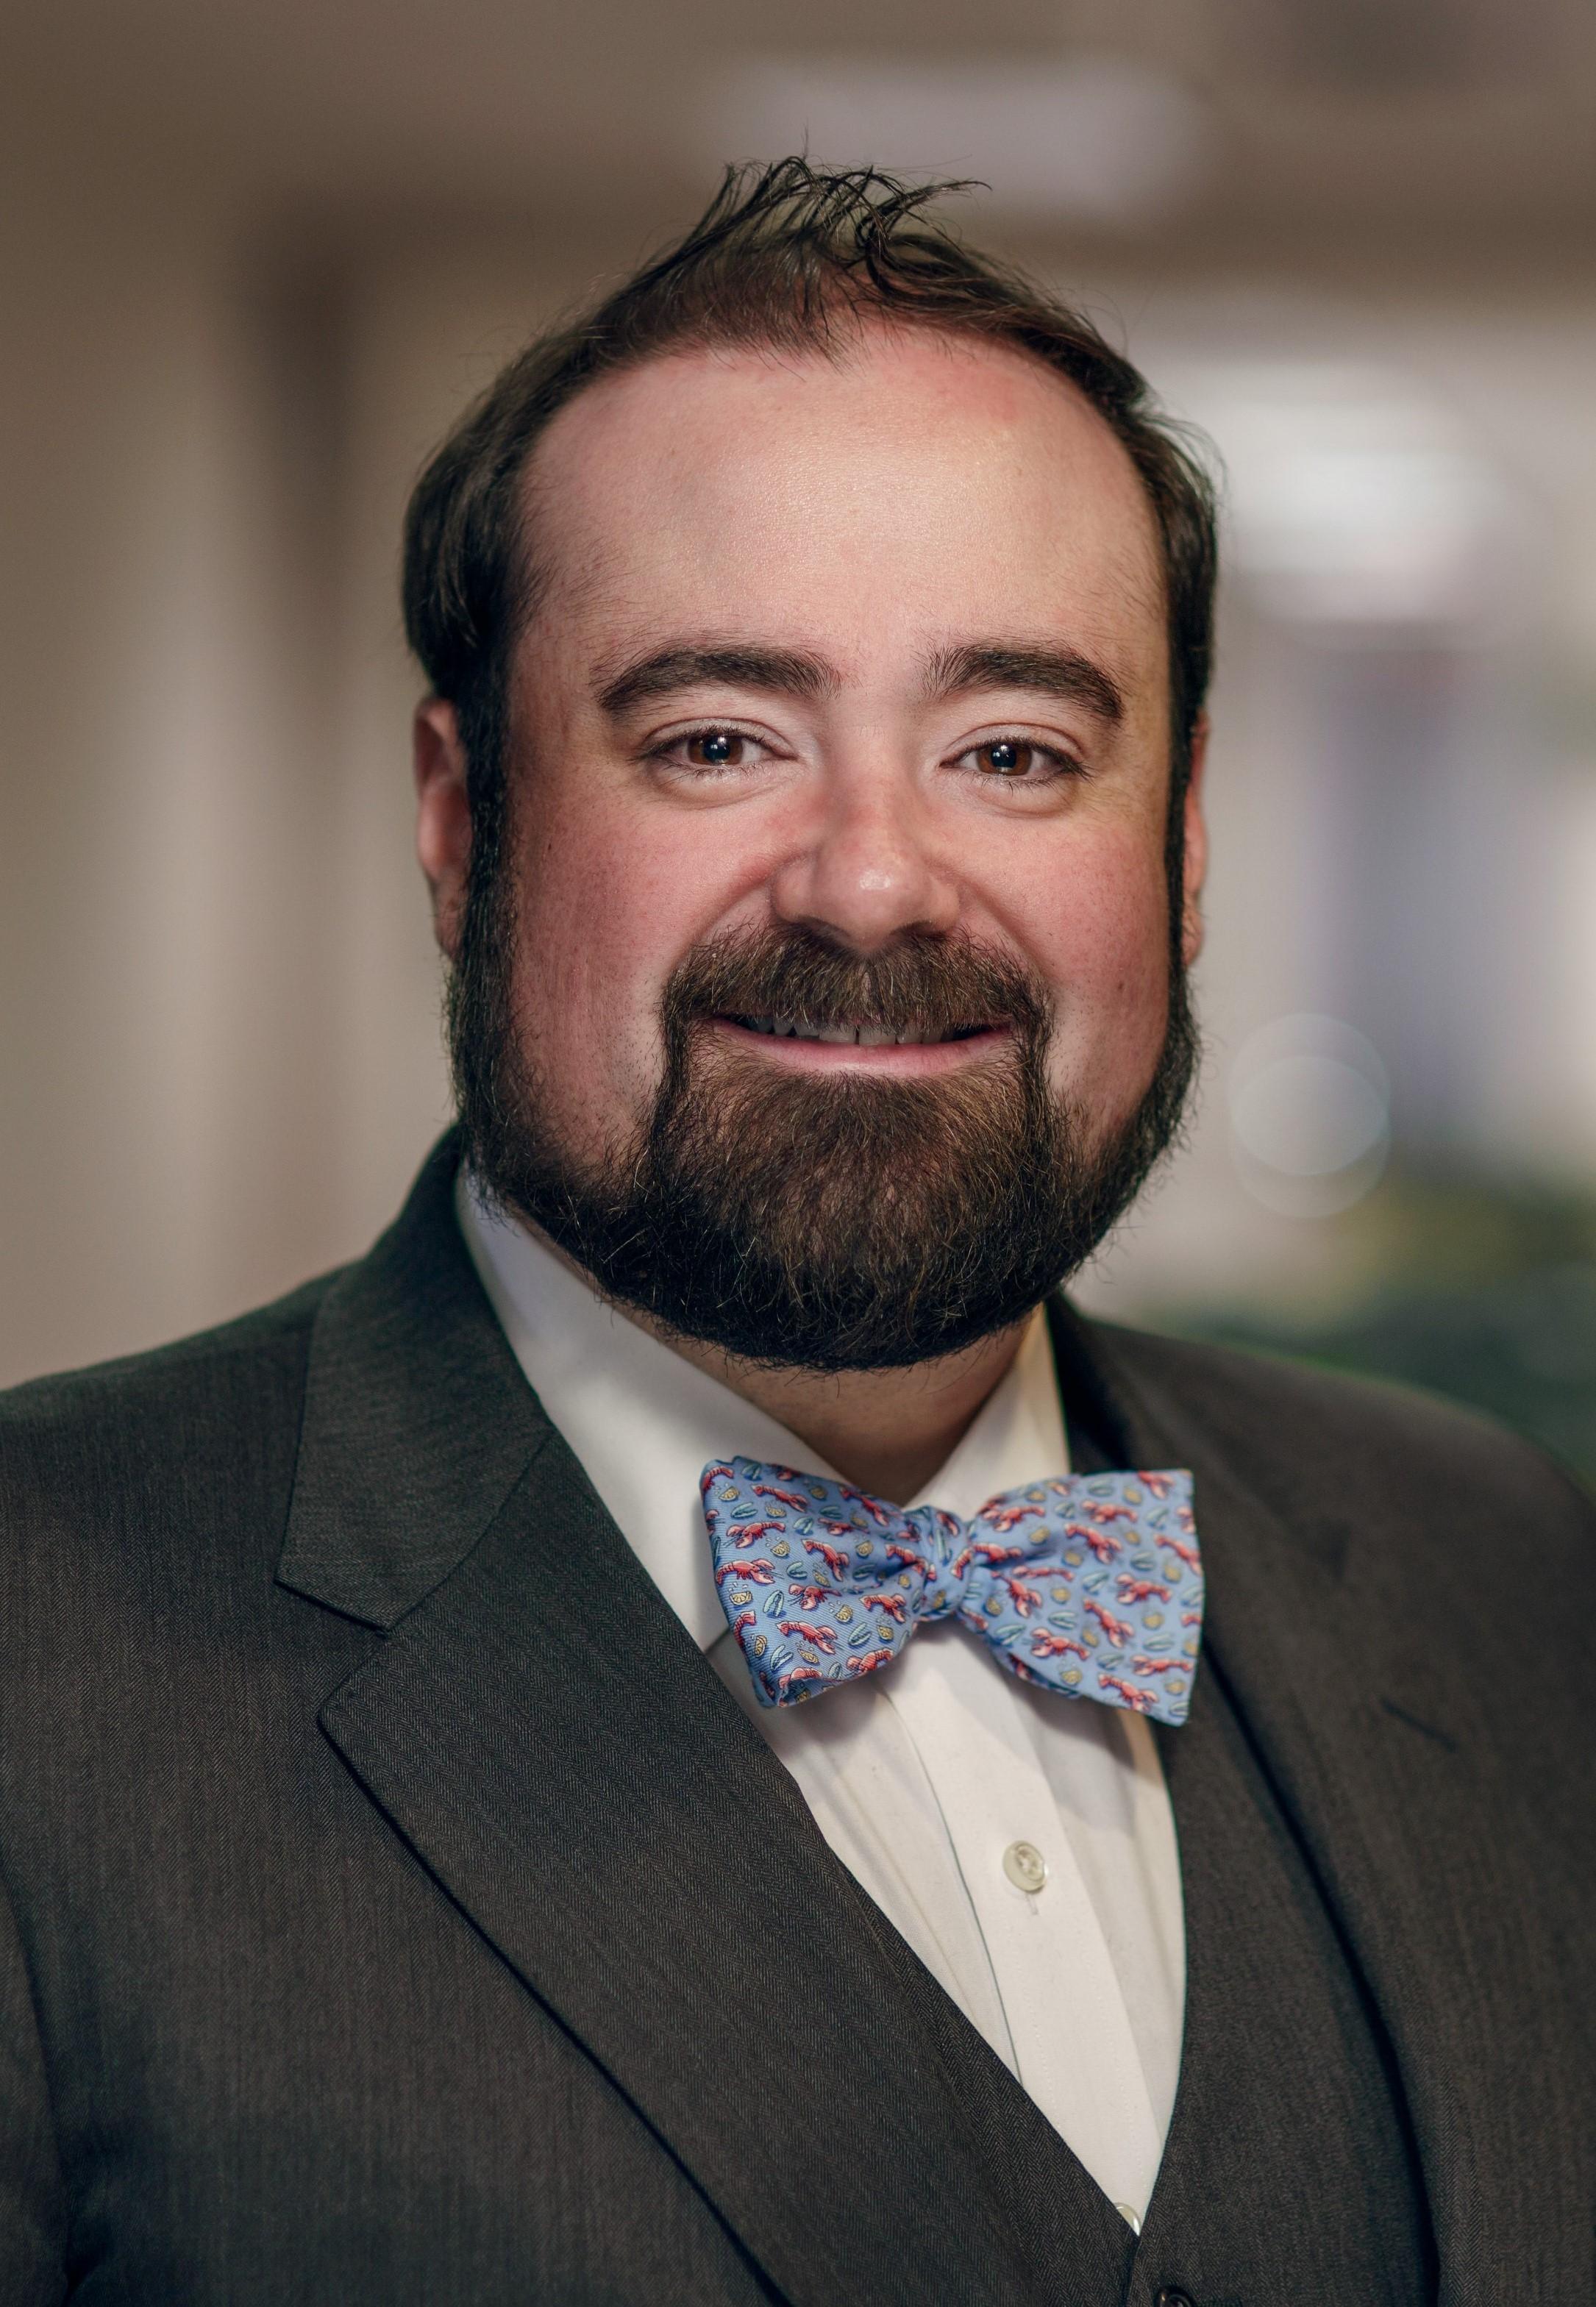 Sean R. Caruthers insurance defense municipal litigation attorney in New Haven CT